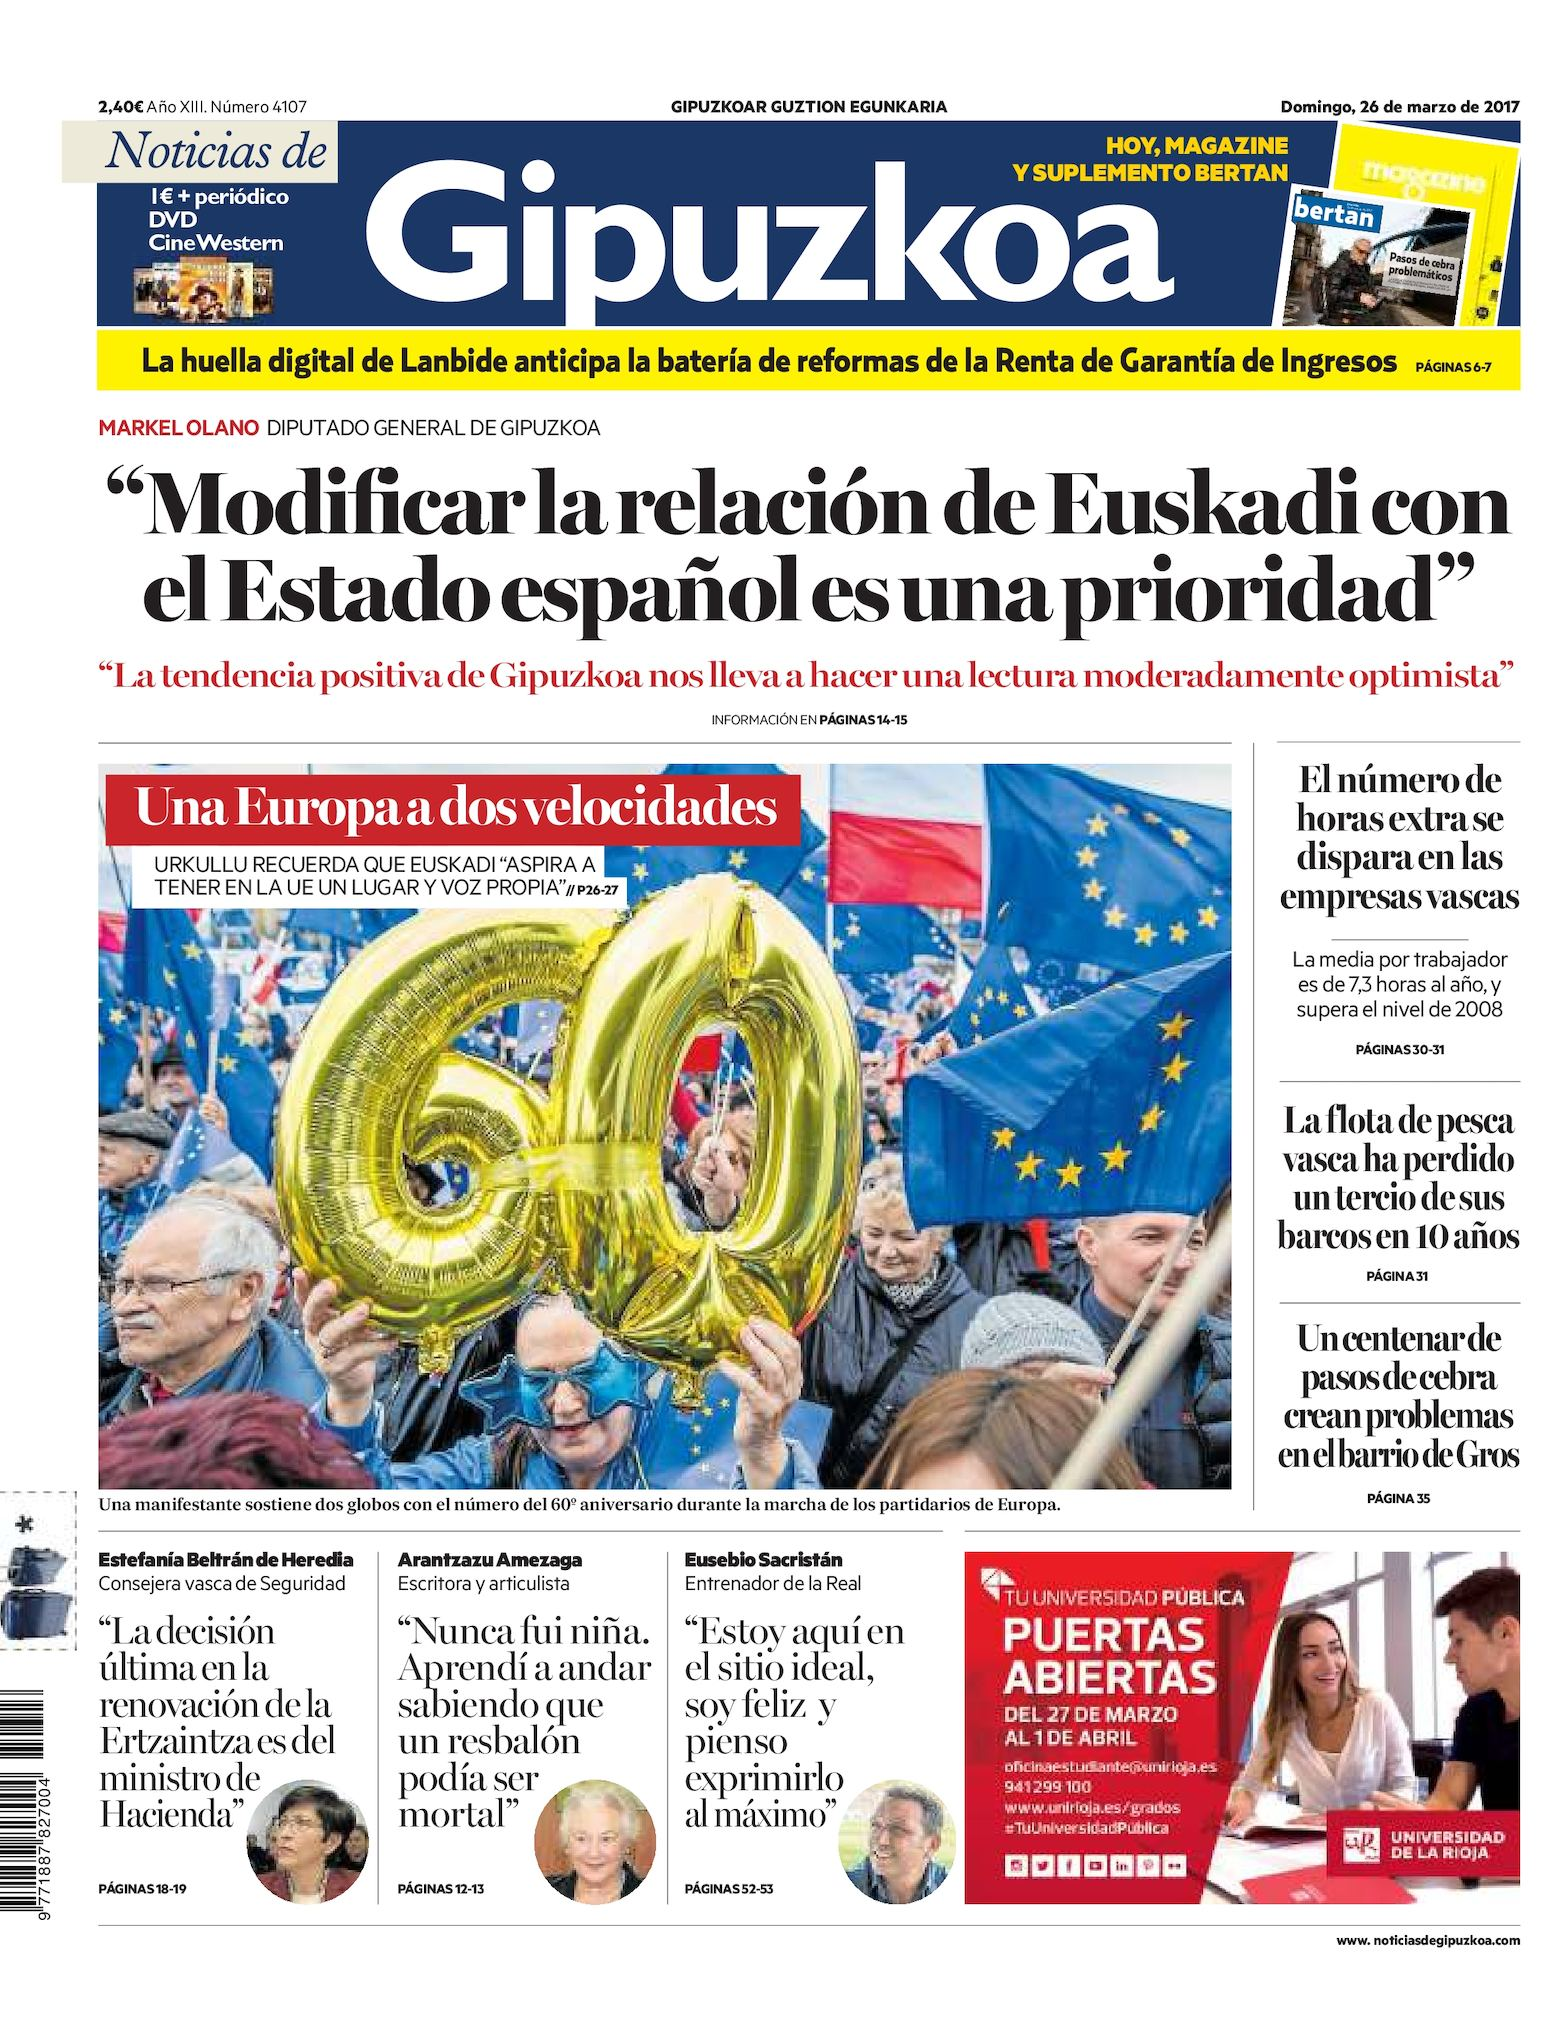 4310c95fc43c Calaméo - Noticias de Gipuzkoa 20170326